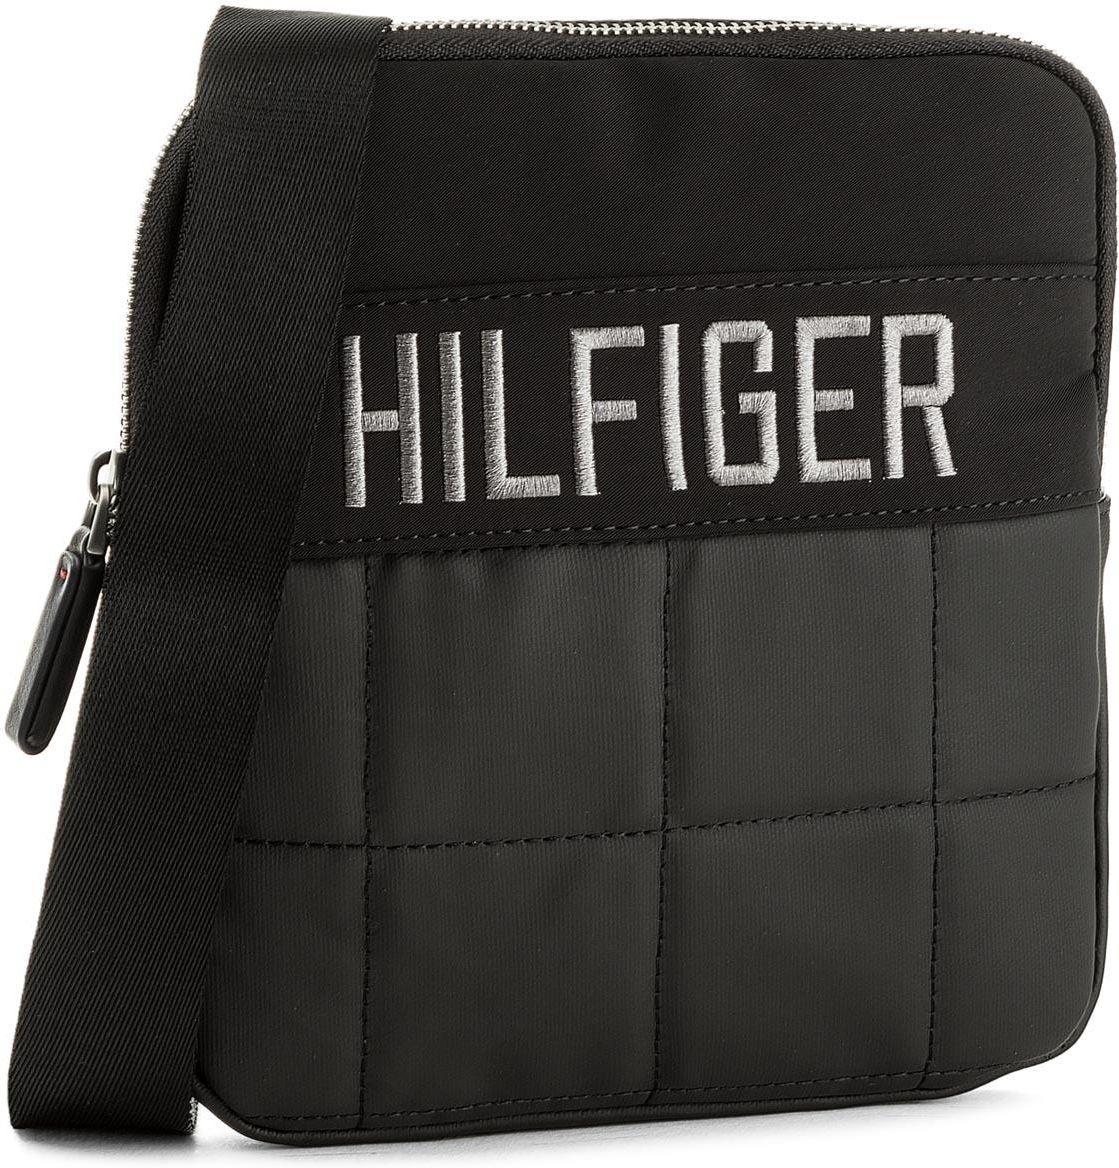 27f1ed3f9de0b Saszetka TOMMY HILFIGER - Hilfiger Go Mini Crossover AM0AM03161 002 -  zdjęcie 1